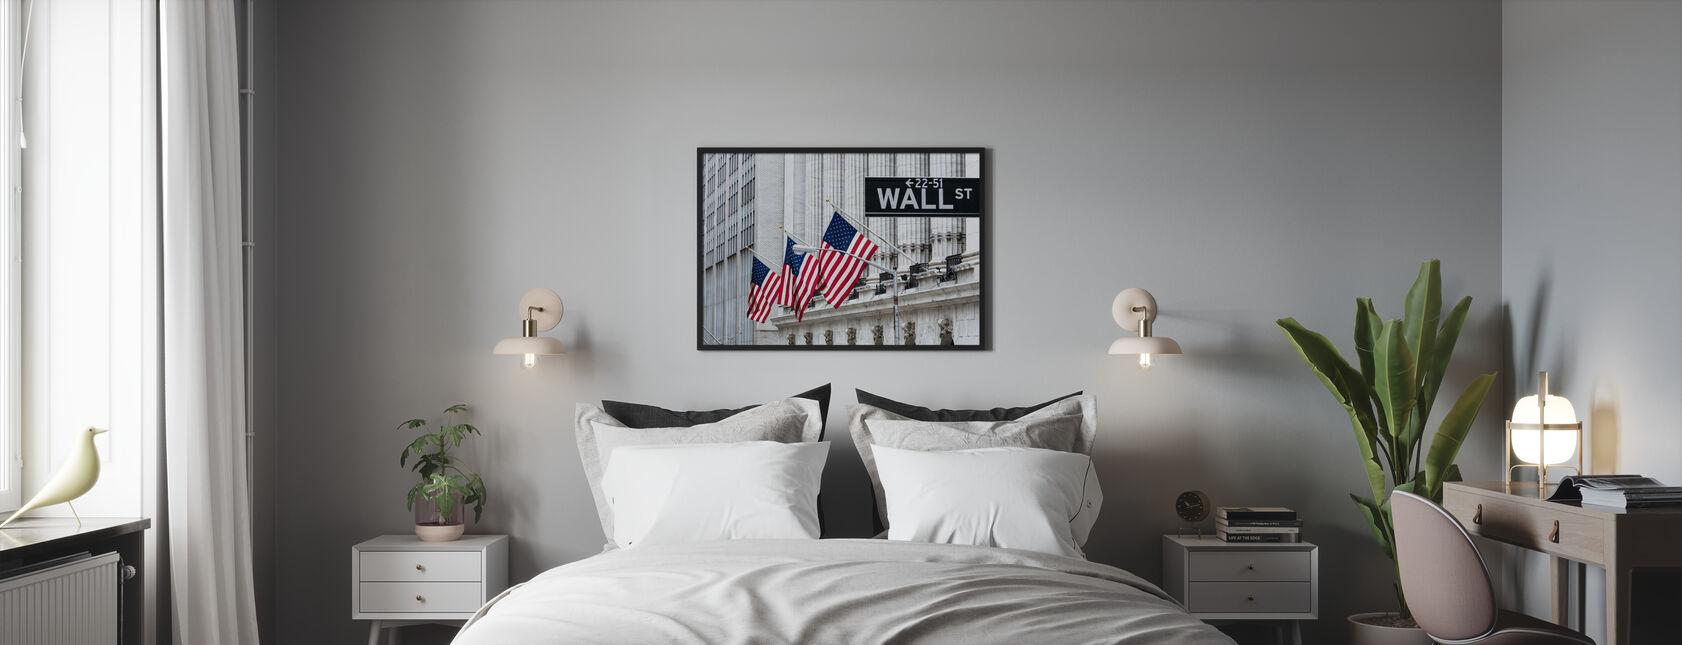 New York Wall Street - Framed print - Bedroom